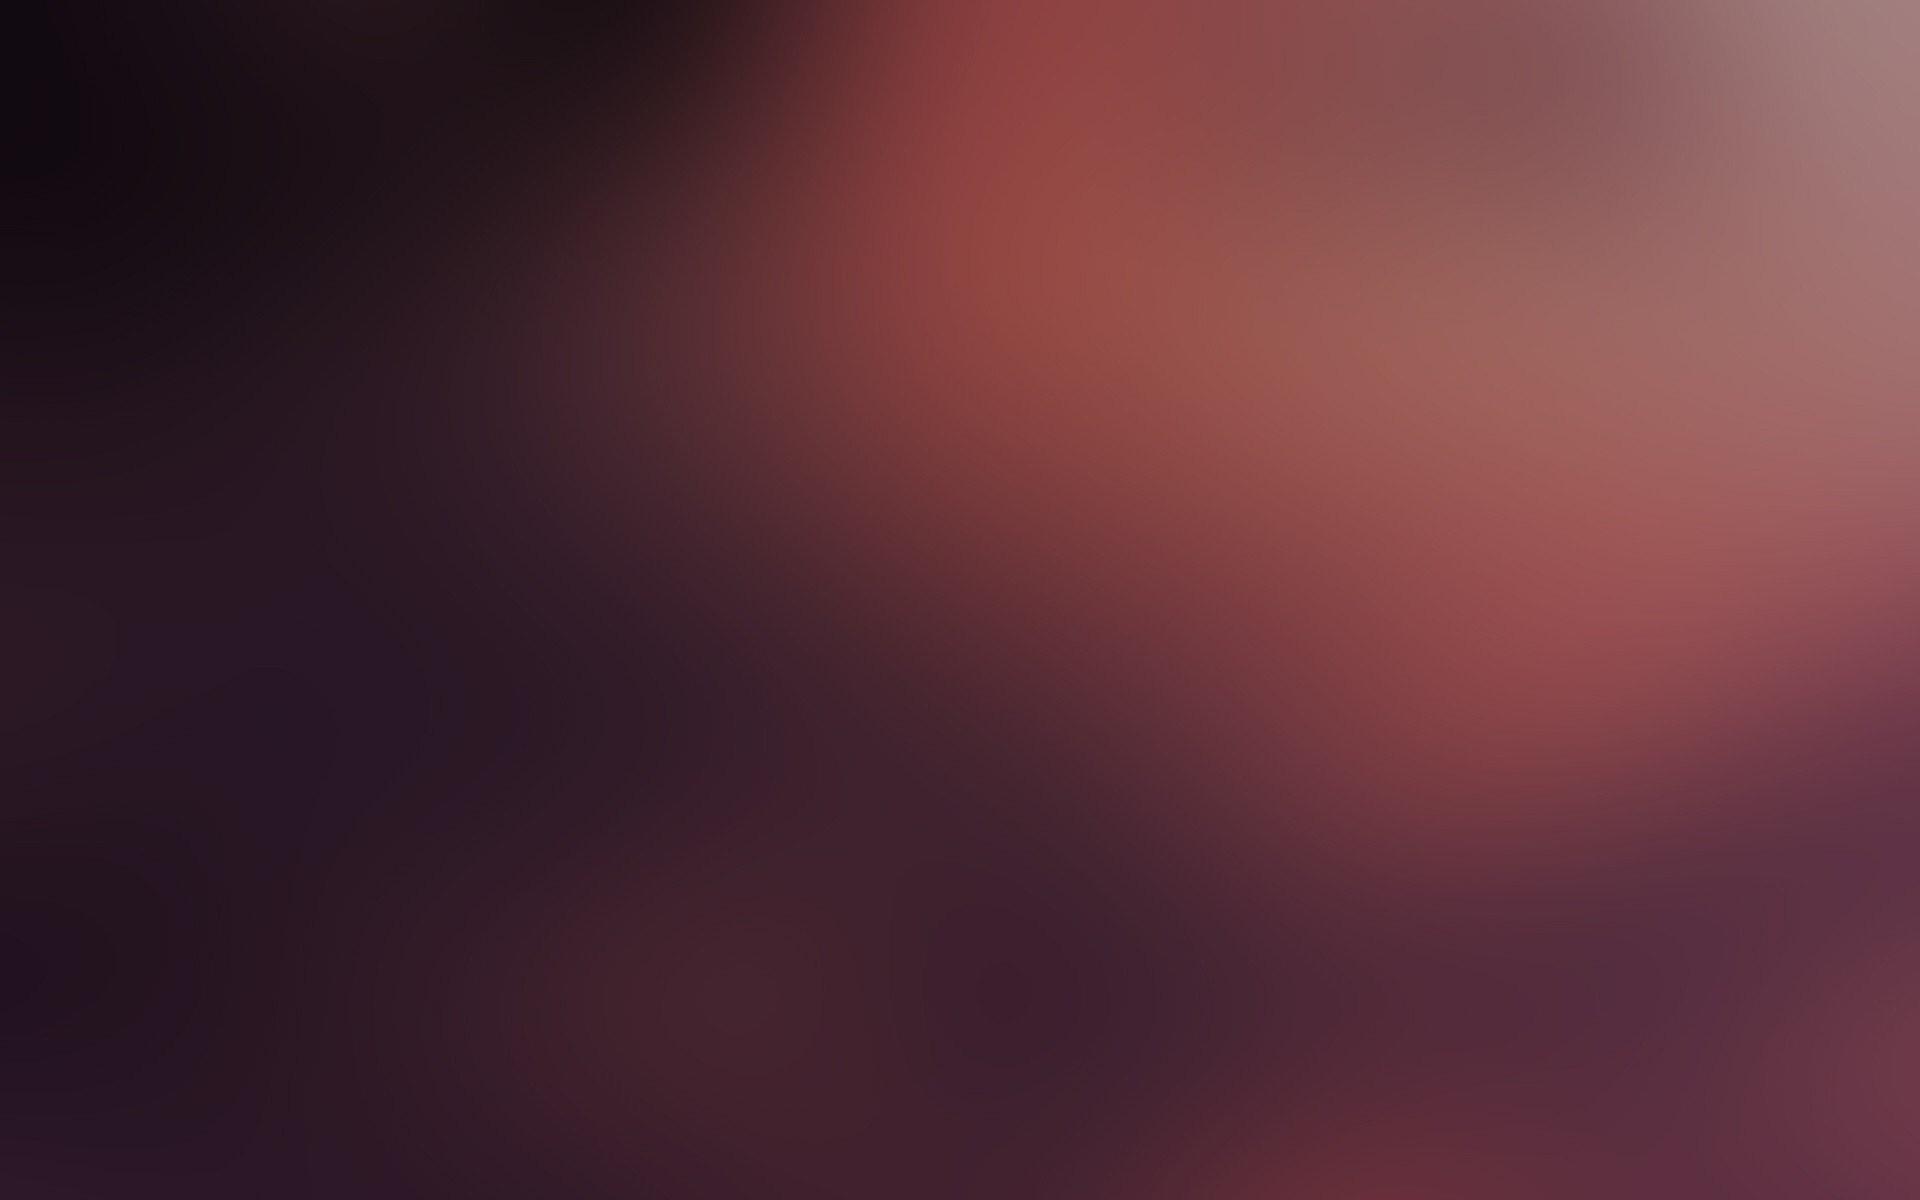 Orange purple gaussian blur gradient simple background blurred colors  wallpaper     296437   WallpaperUP